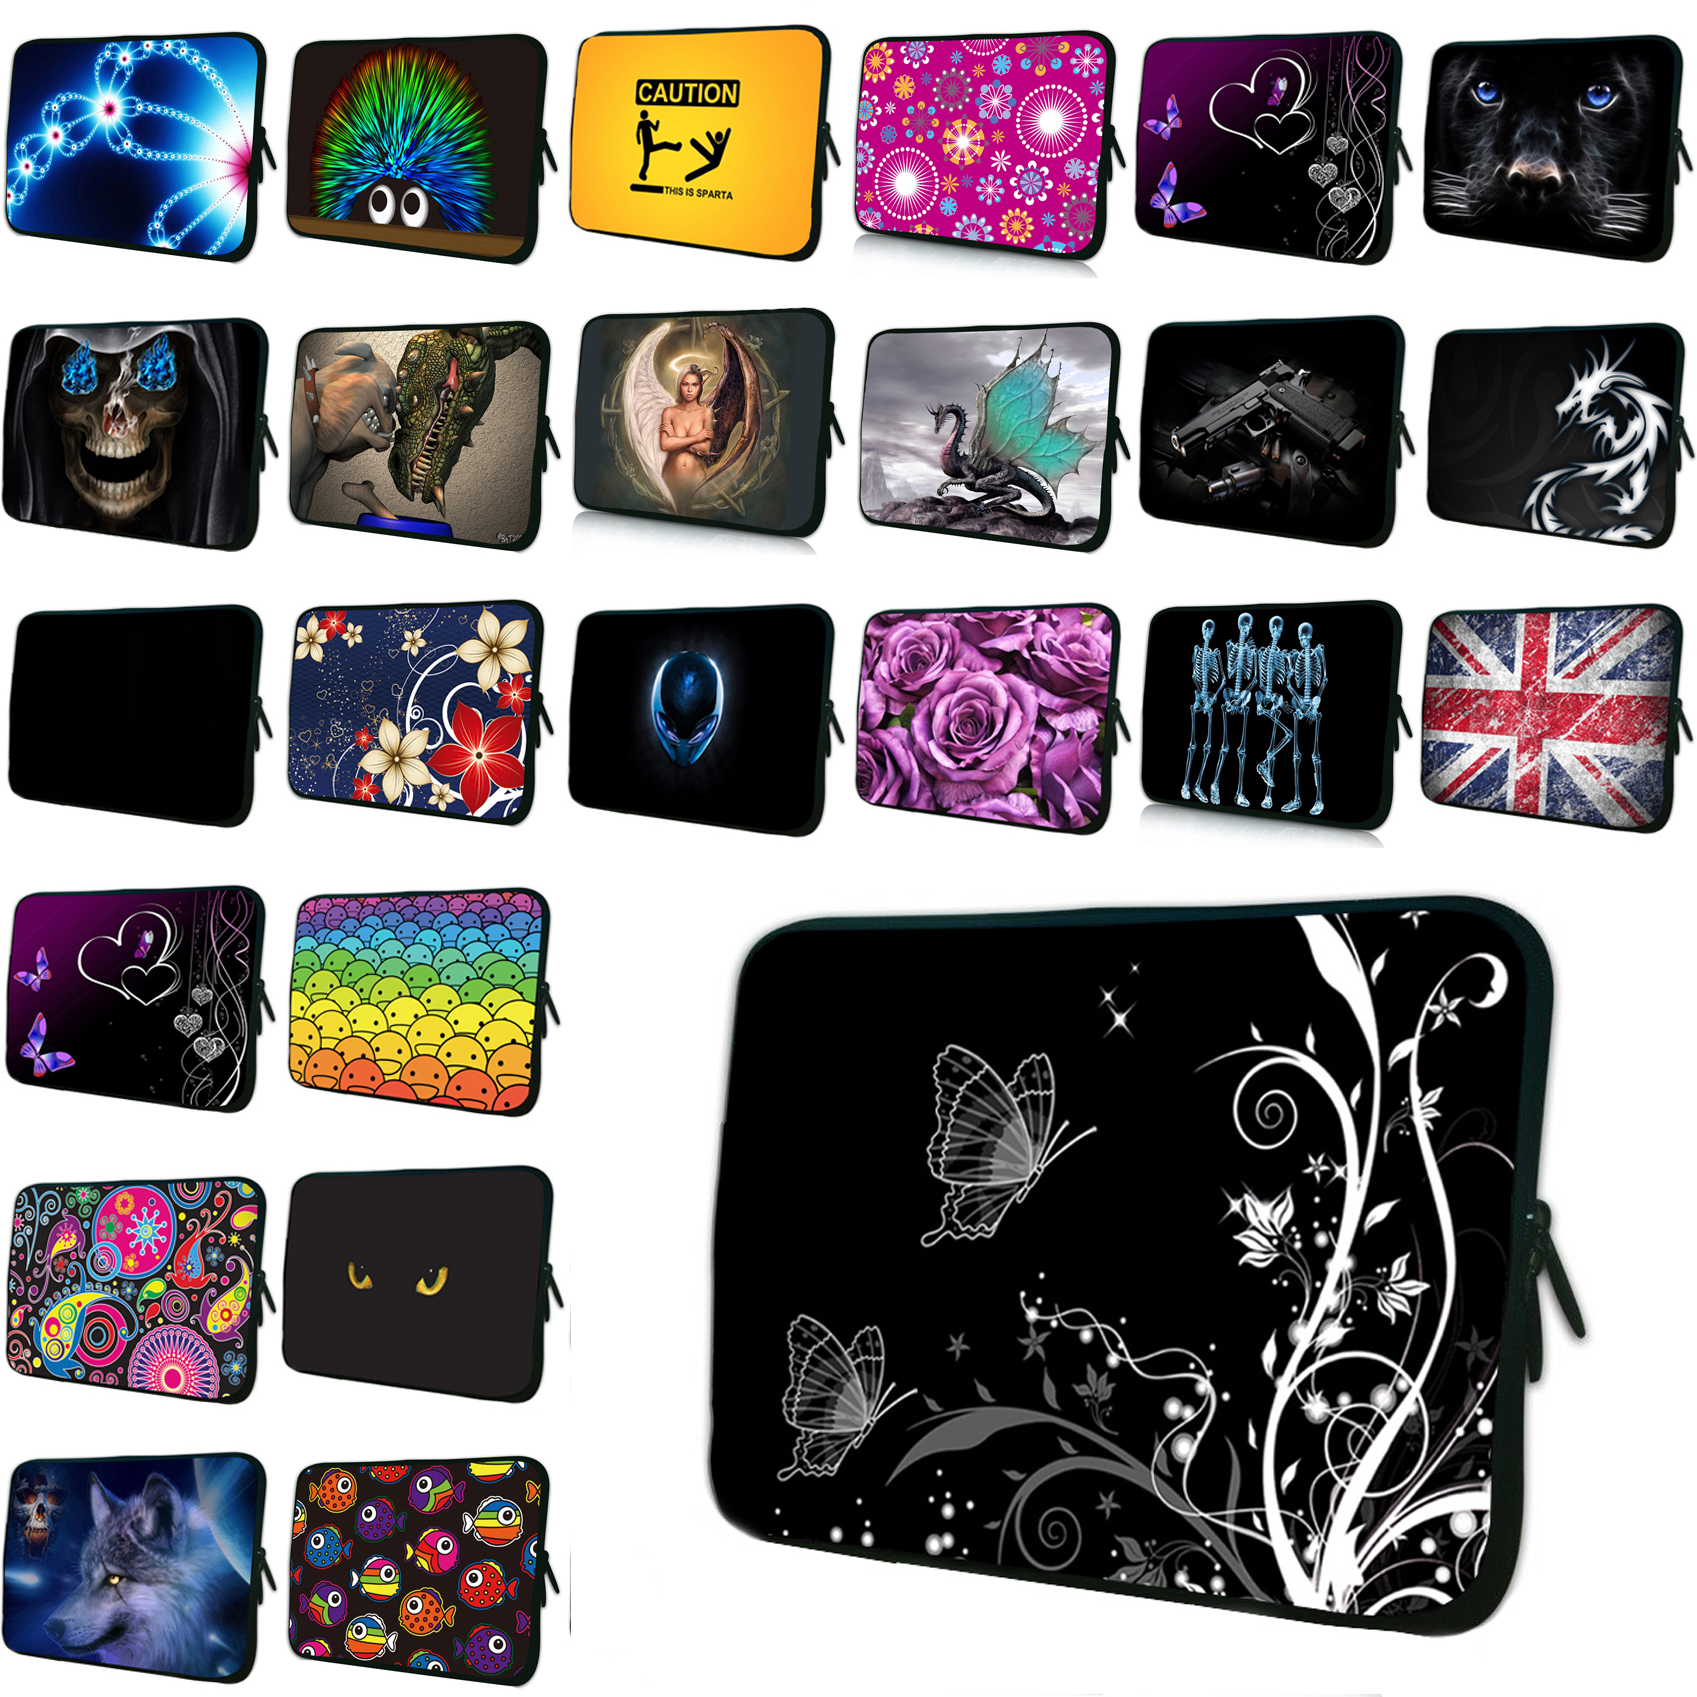 10 Mini PC Netbook Zipper Shell Cover Pouch Bag For Chuwi Hi10 Lenovo Apple Huawei 9.7 10.1 Chromebook Laptop Bags & Cases